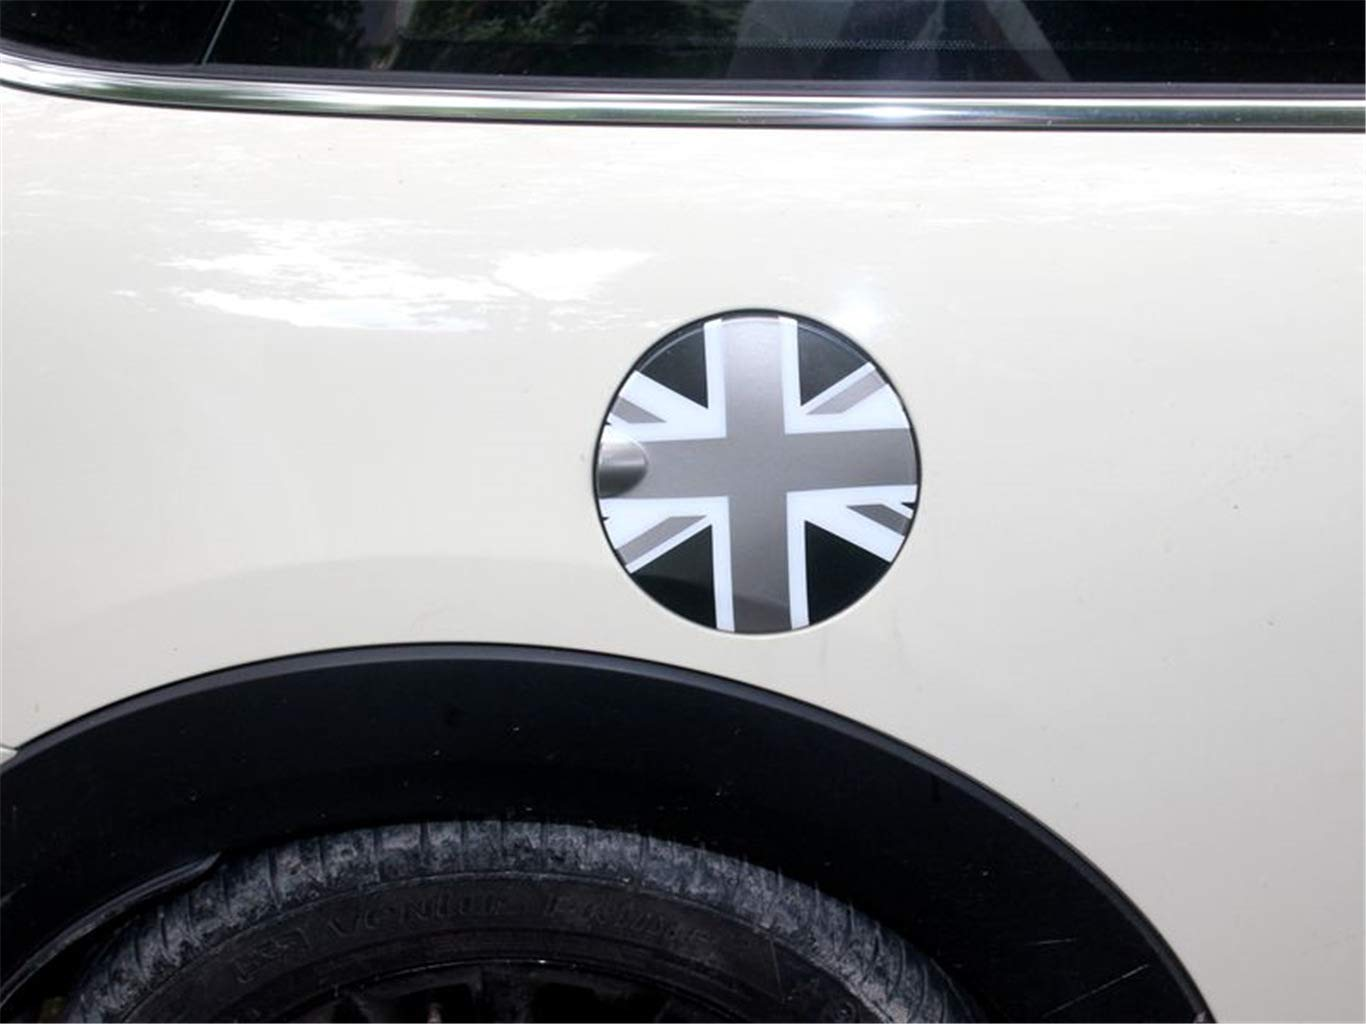 Black//Gray Union Jack UK Flag ABS Sticker Cover Trim Cap for Mini Cooper ONE S JCW R Series R60 Countryman R61 Paceman 2010-2016 Interior Door Handle + Storage Box Handle 5 Pieces